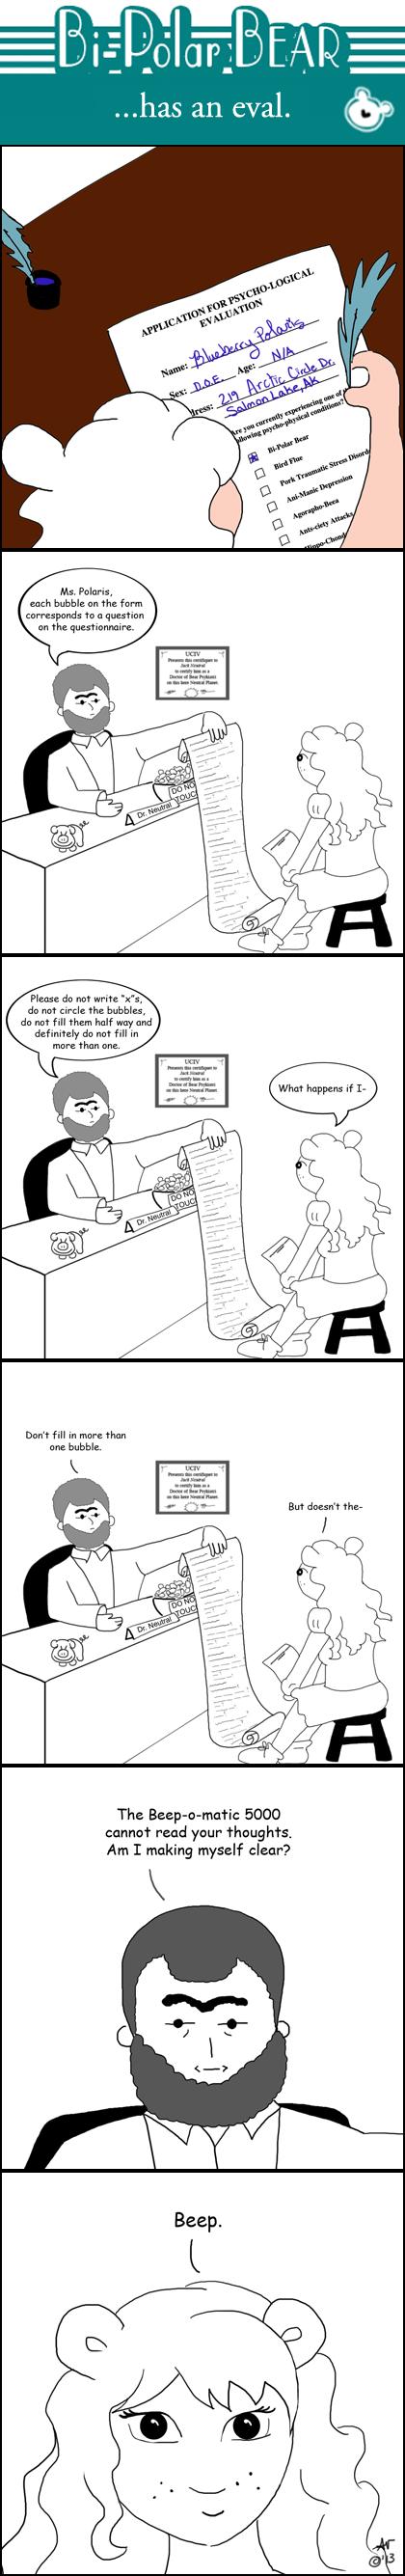 Bipolar Bear Psychological Evaluation